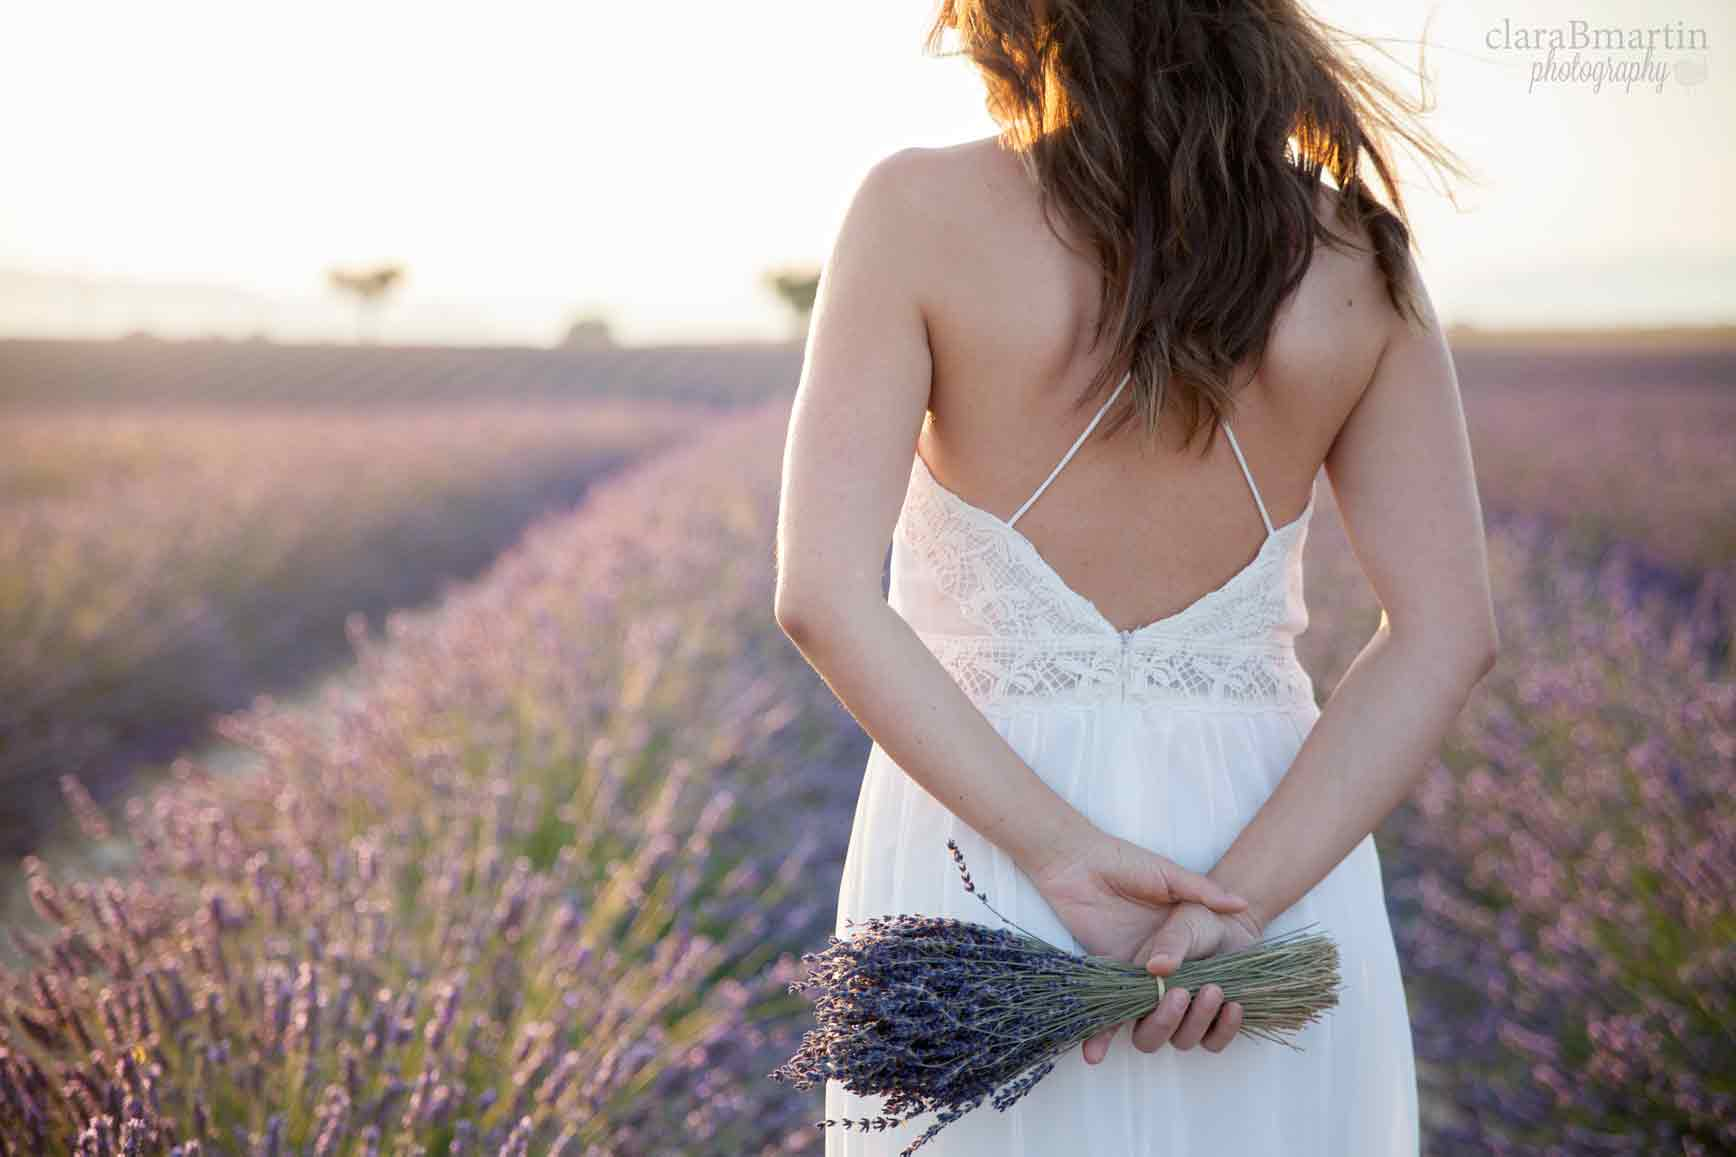 Lavender-fields-Provence-claraBmartin09